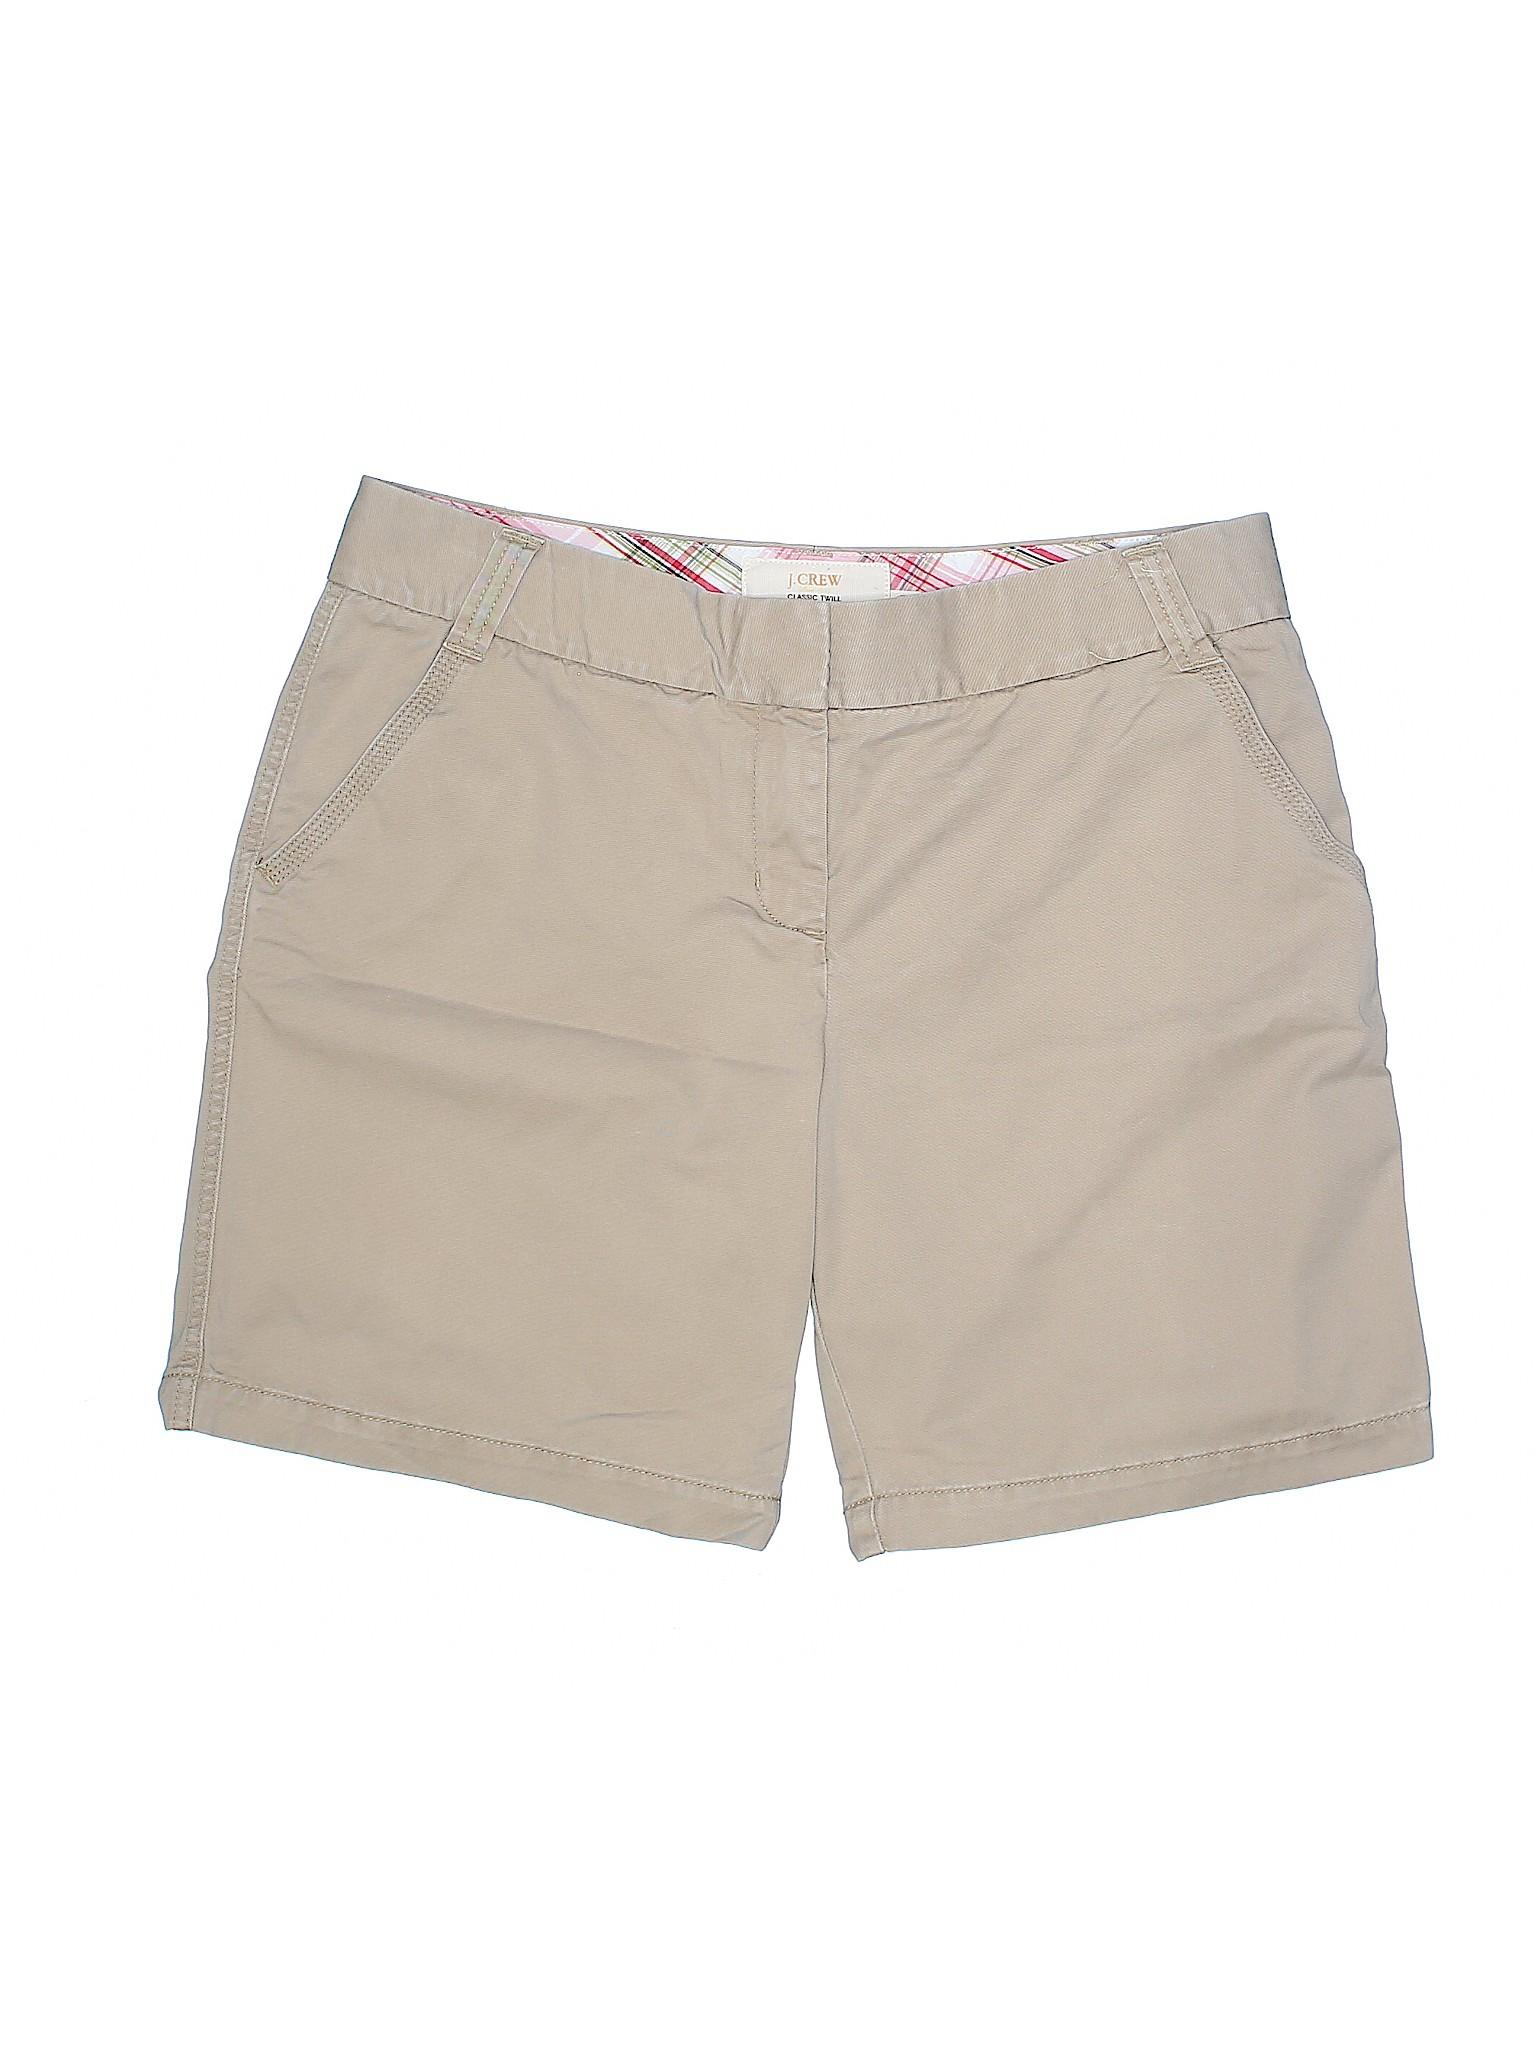 winter Shorts Leisure Khaki J Crew z77dHq8w